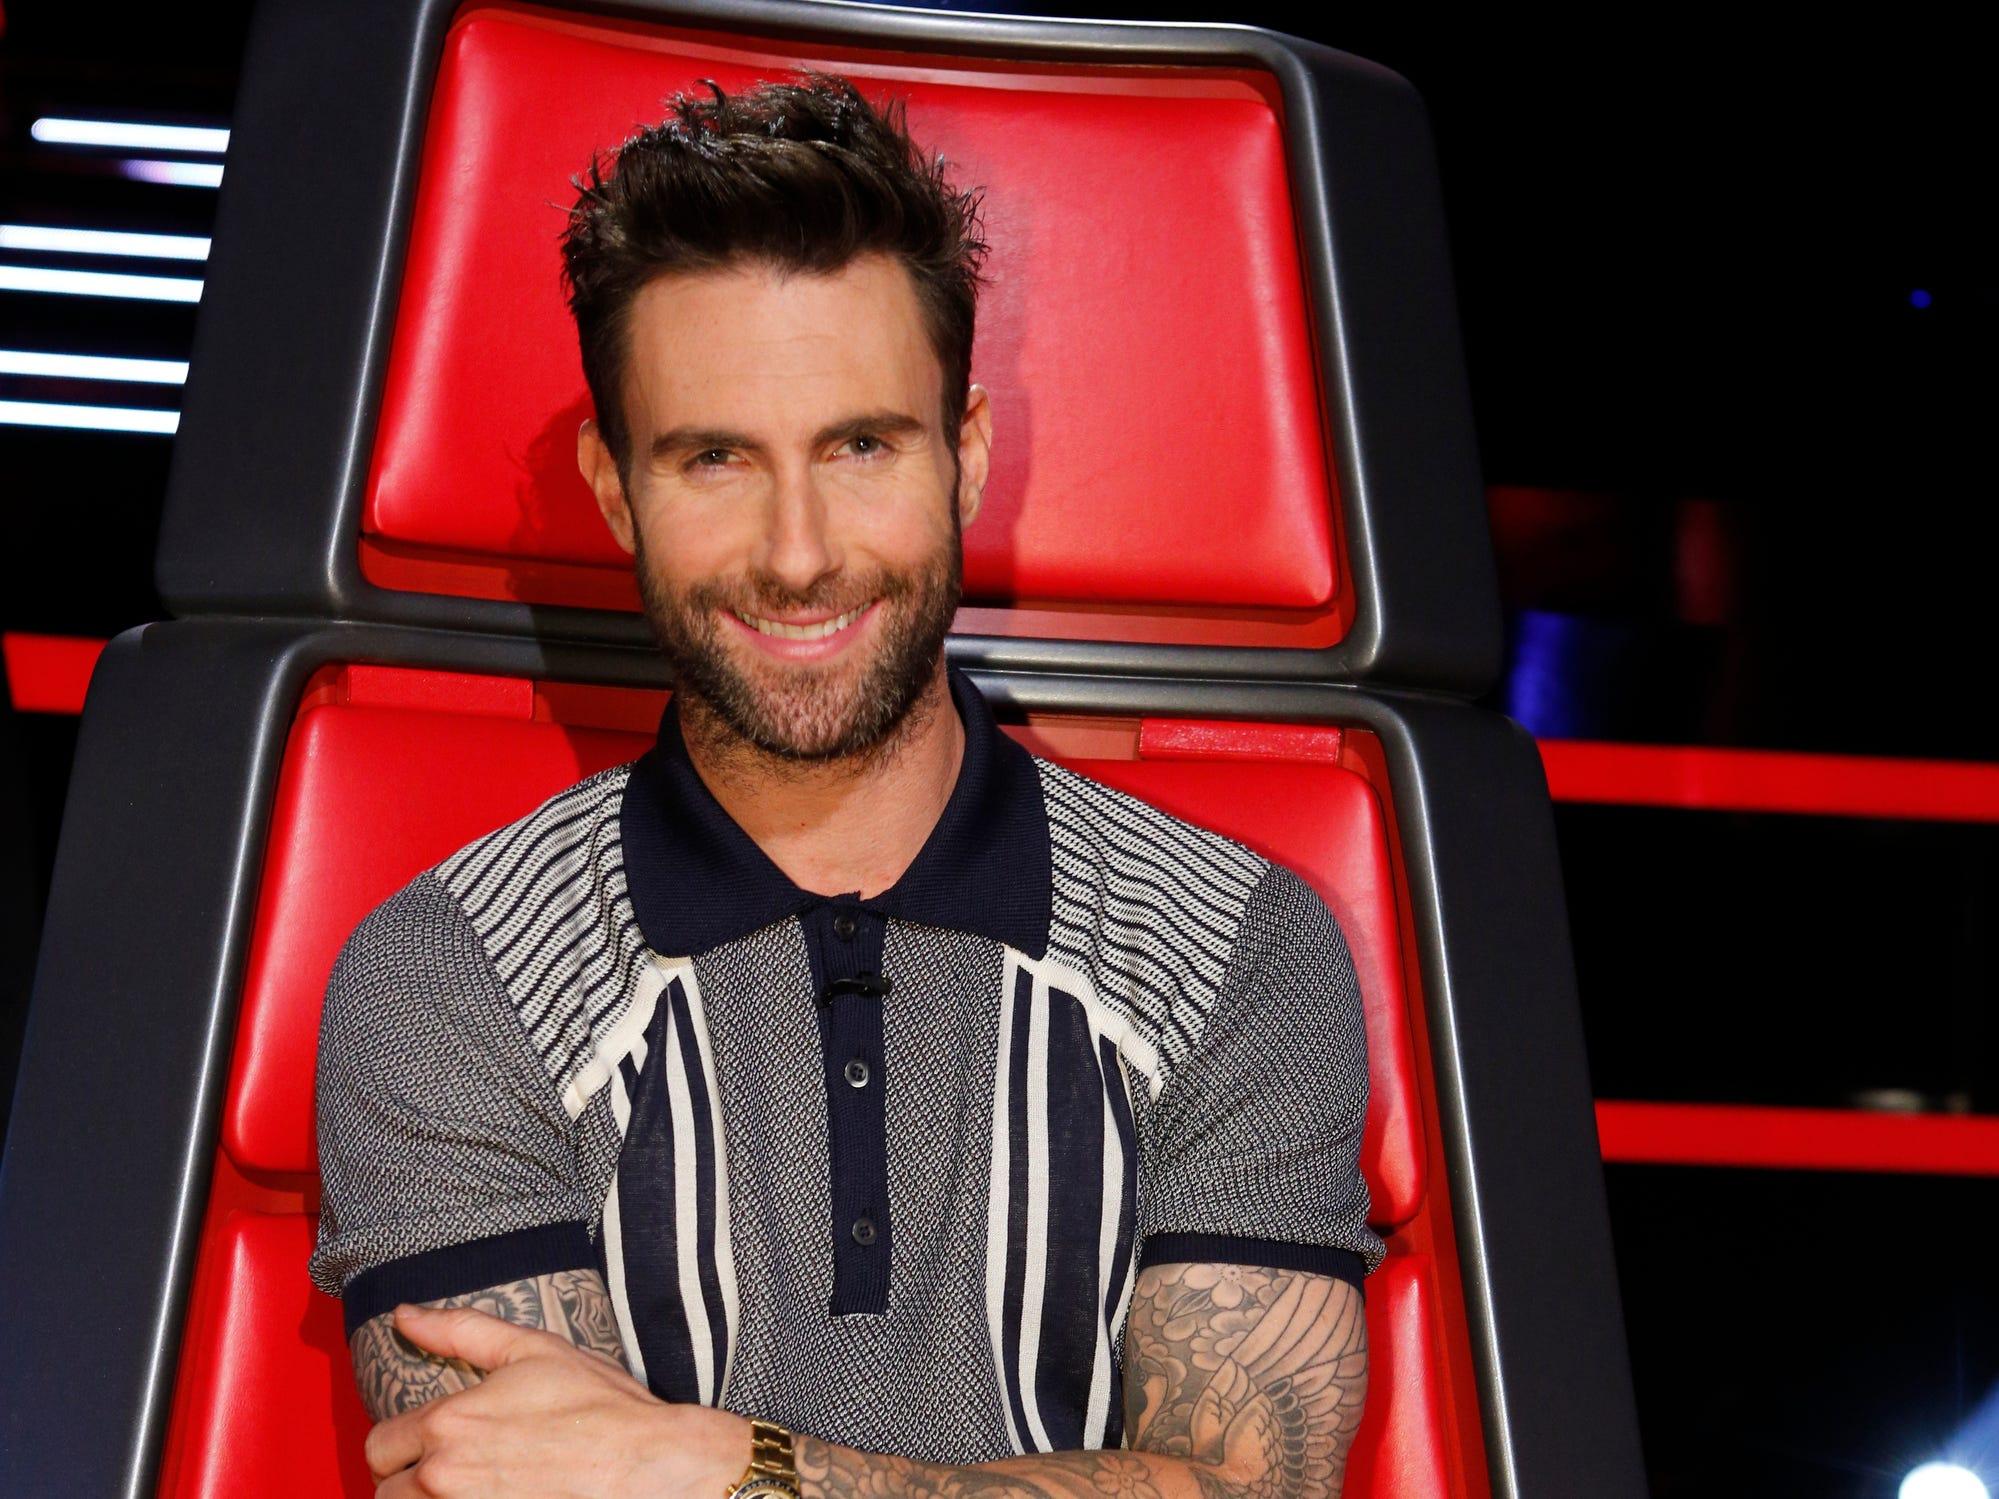 Adam Levine exits 'The Voice' after 16 seasons; Gwen Stefani will return